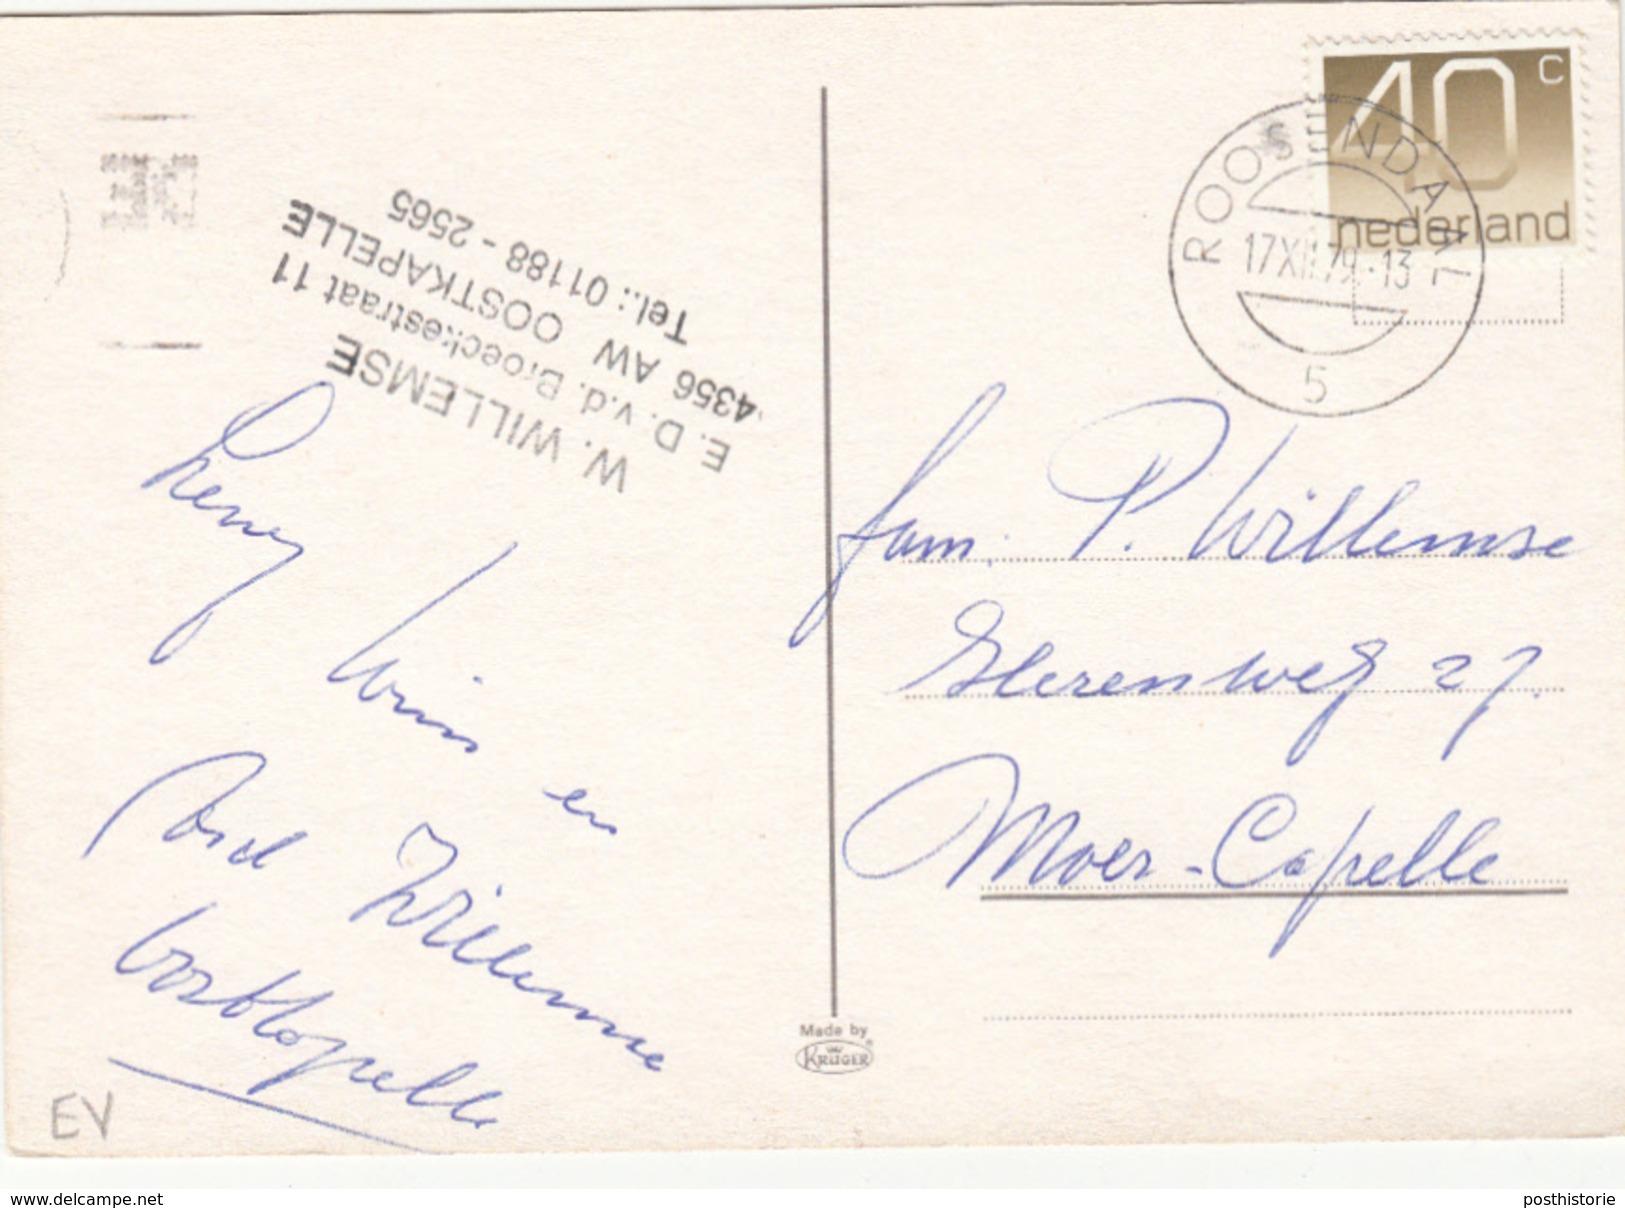 Ansicht 17 Dec 1979 Roosendaal (type Openbalk) - Postal History